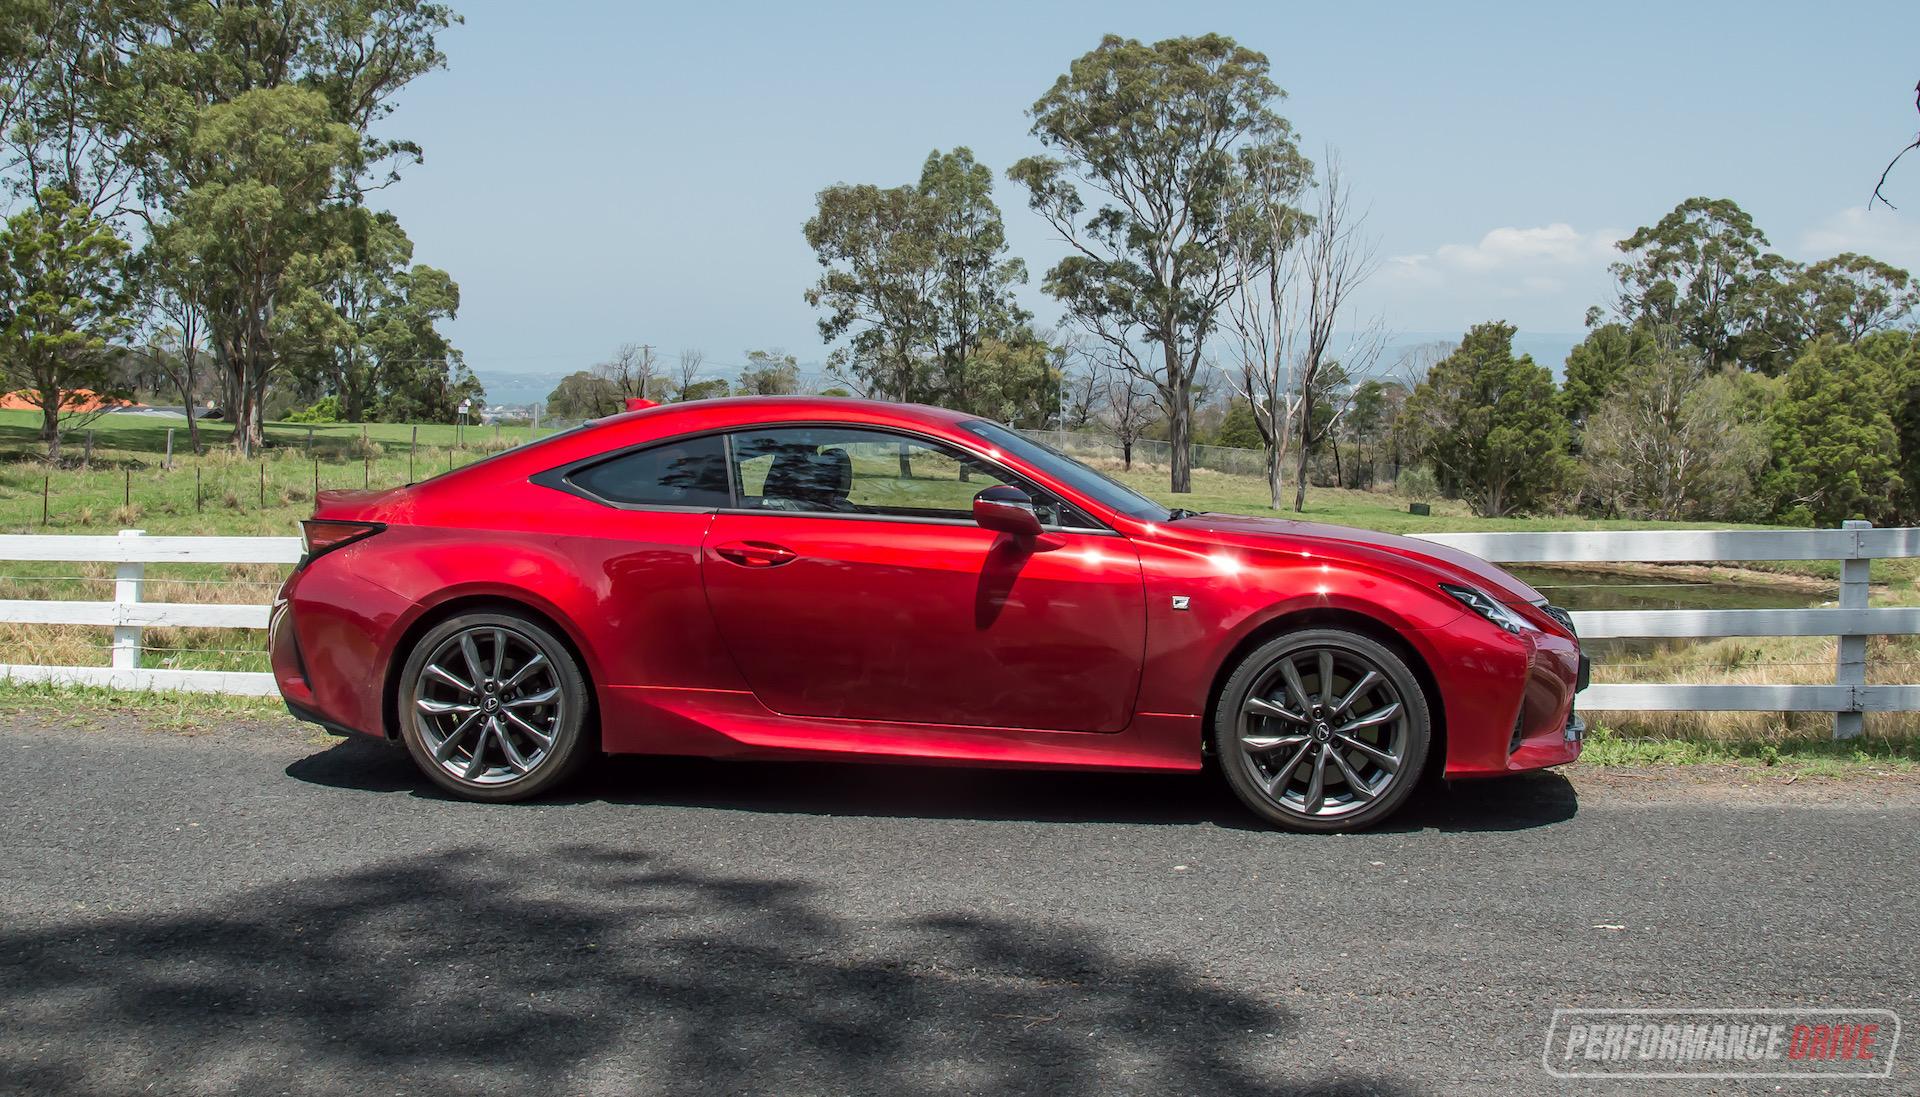 2020 Lexus Rc 350 F Sport Review Video Performancedrive